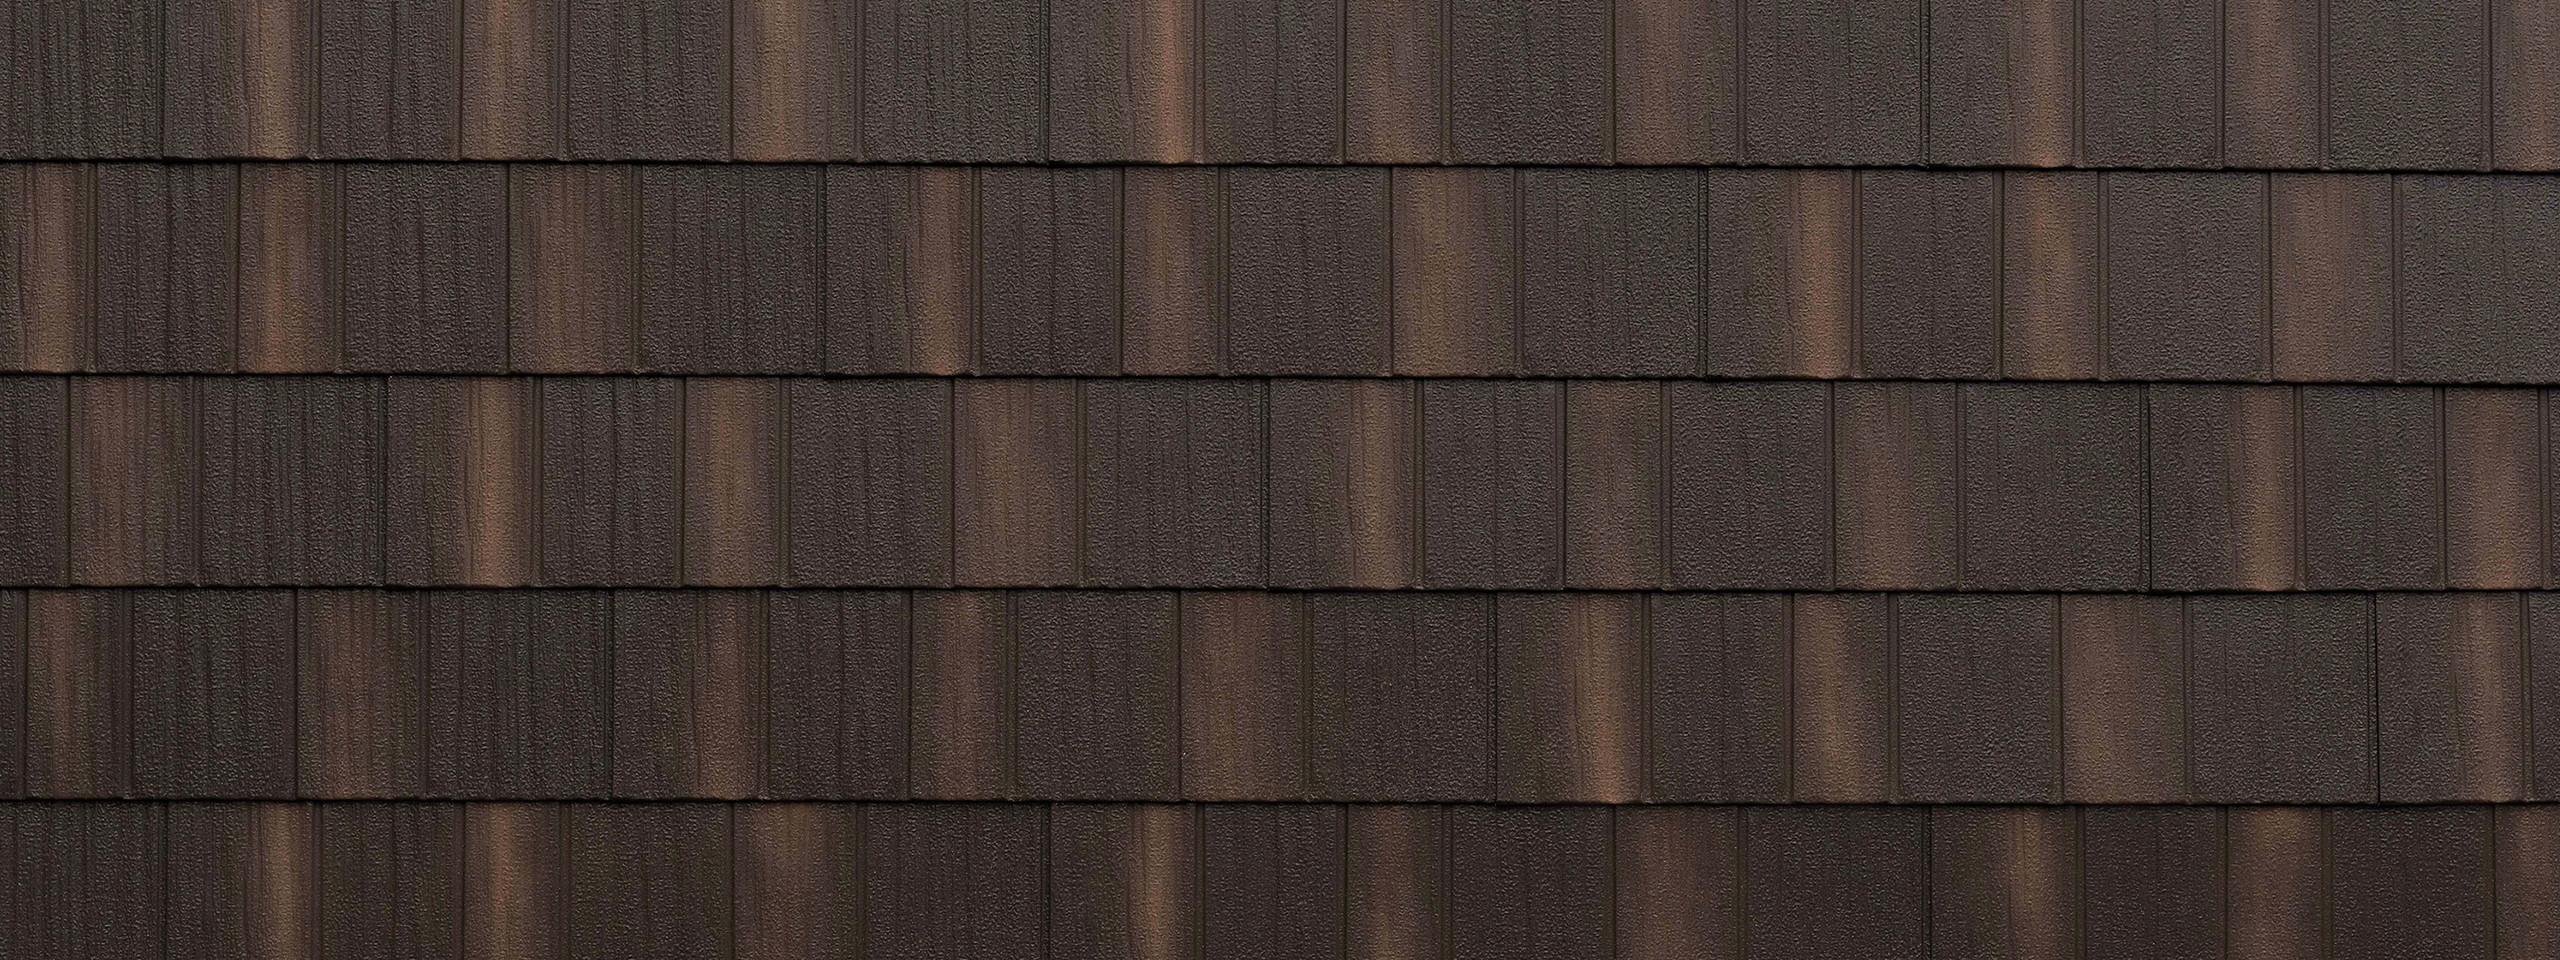 Infiniti aged bronze stone coated shake roofing